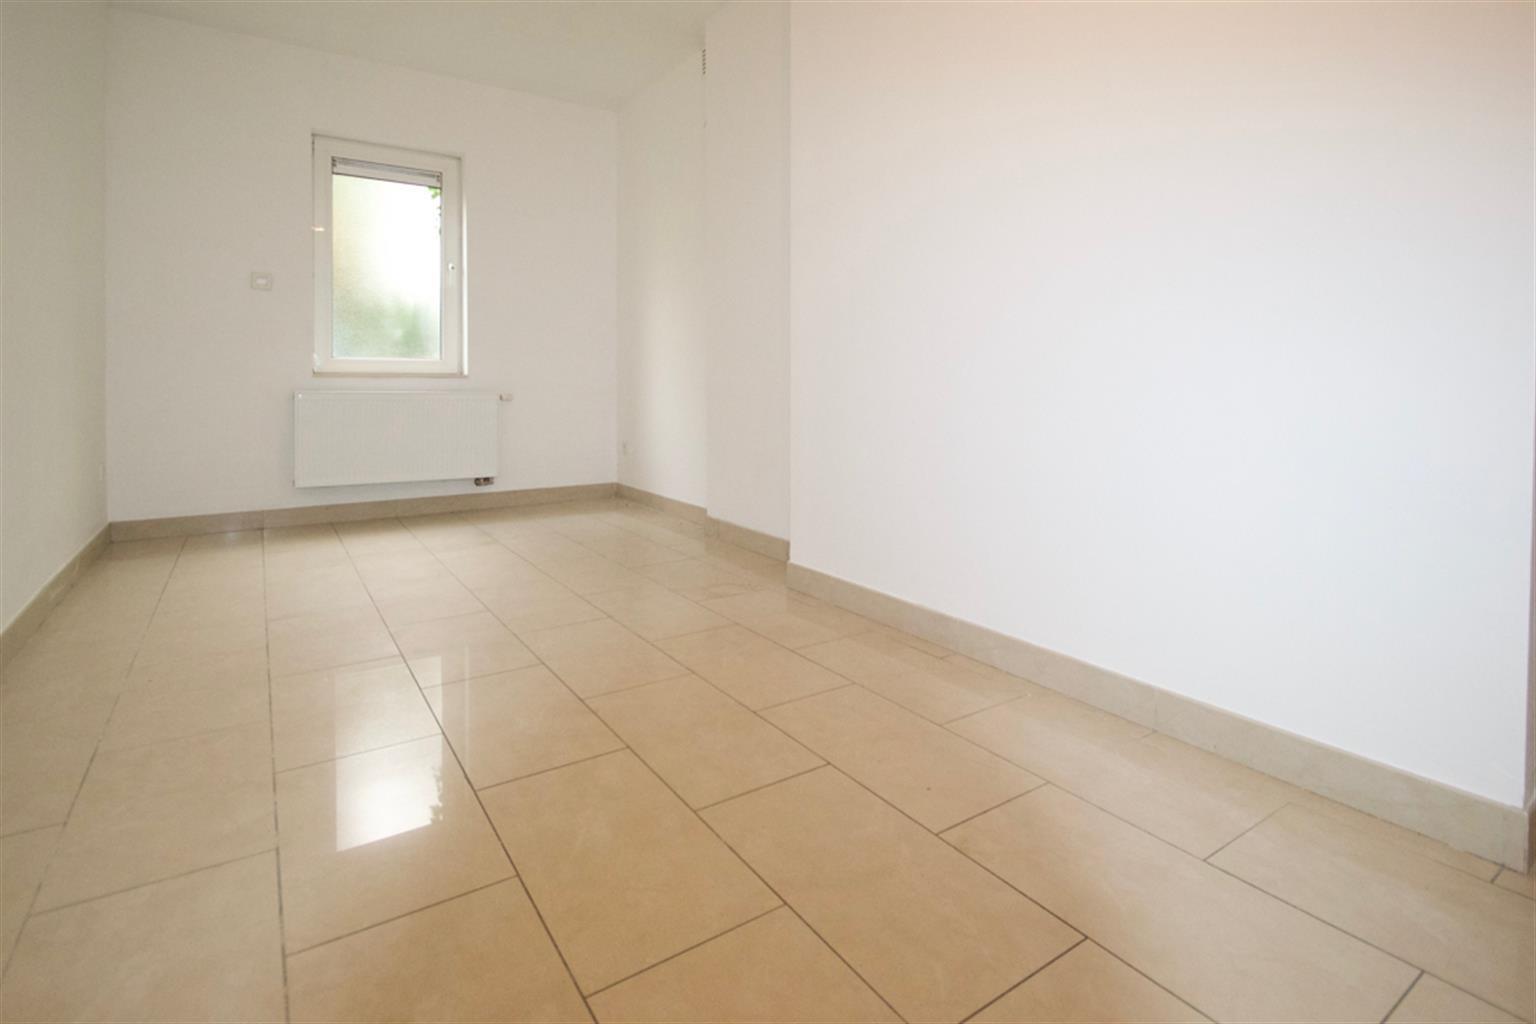 Appartement - Binche Leval-Trahegnies - #4172288-3